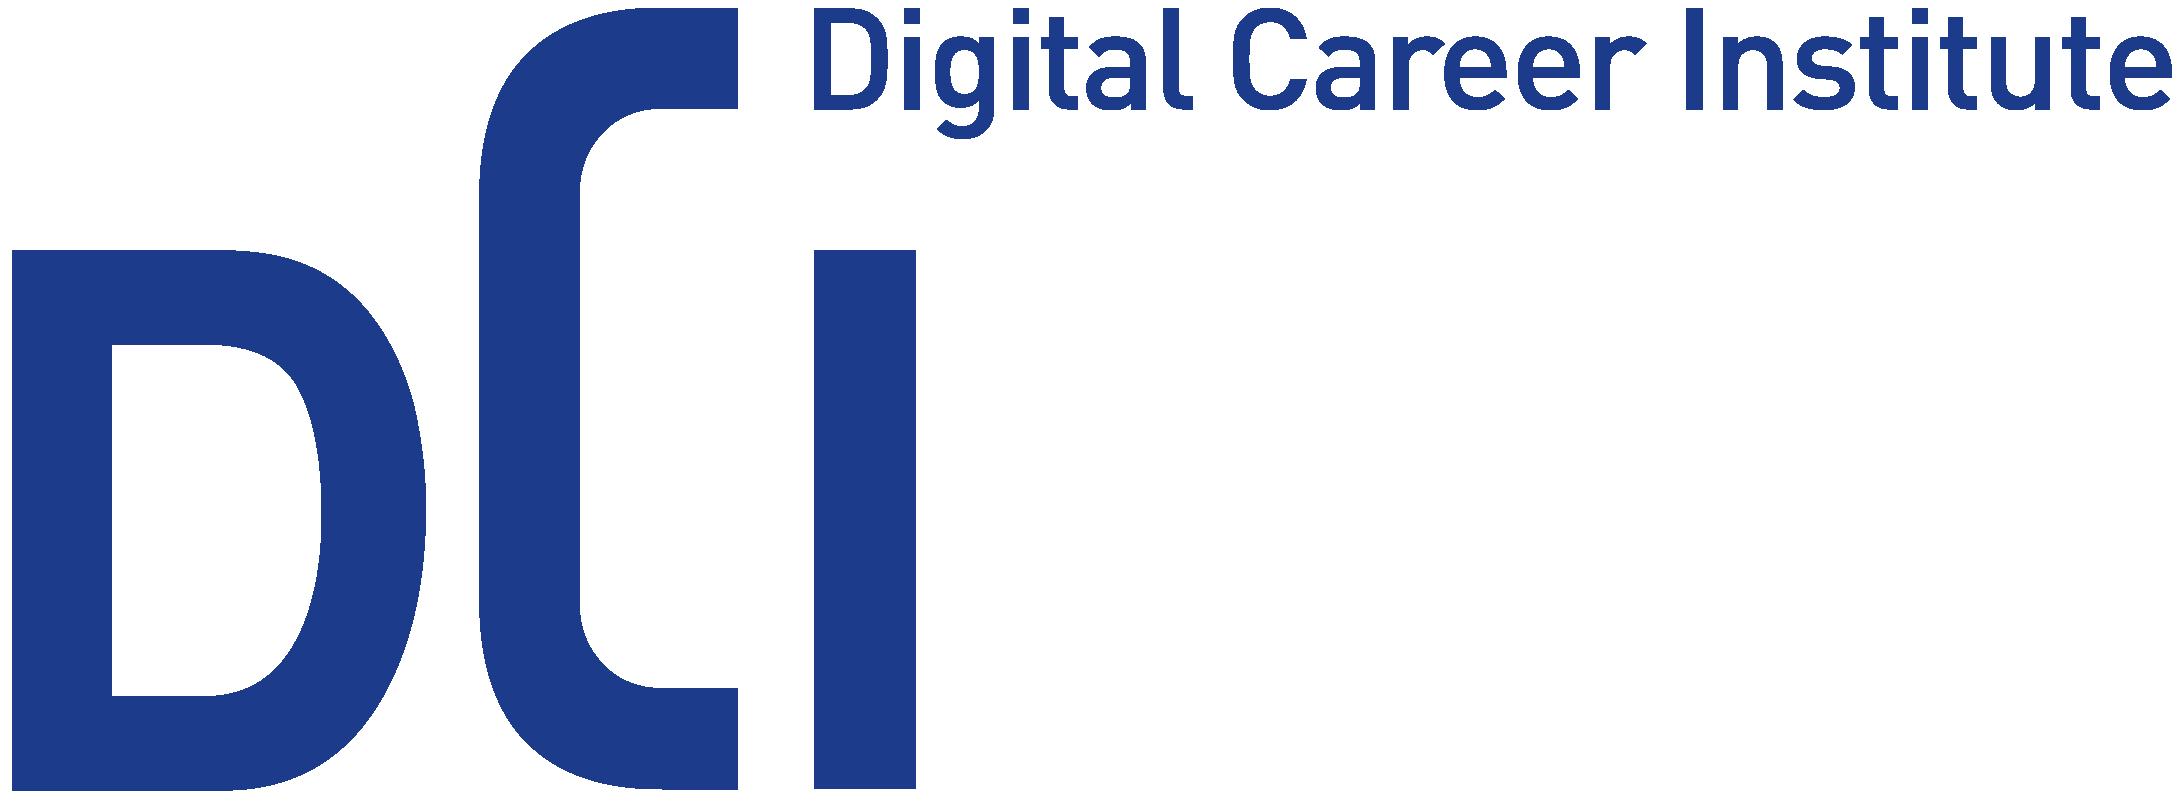 Unternehmens-Logo von DCI Digital Career Institute